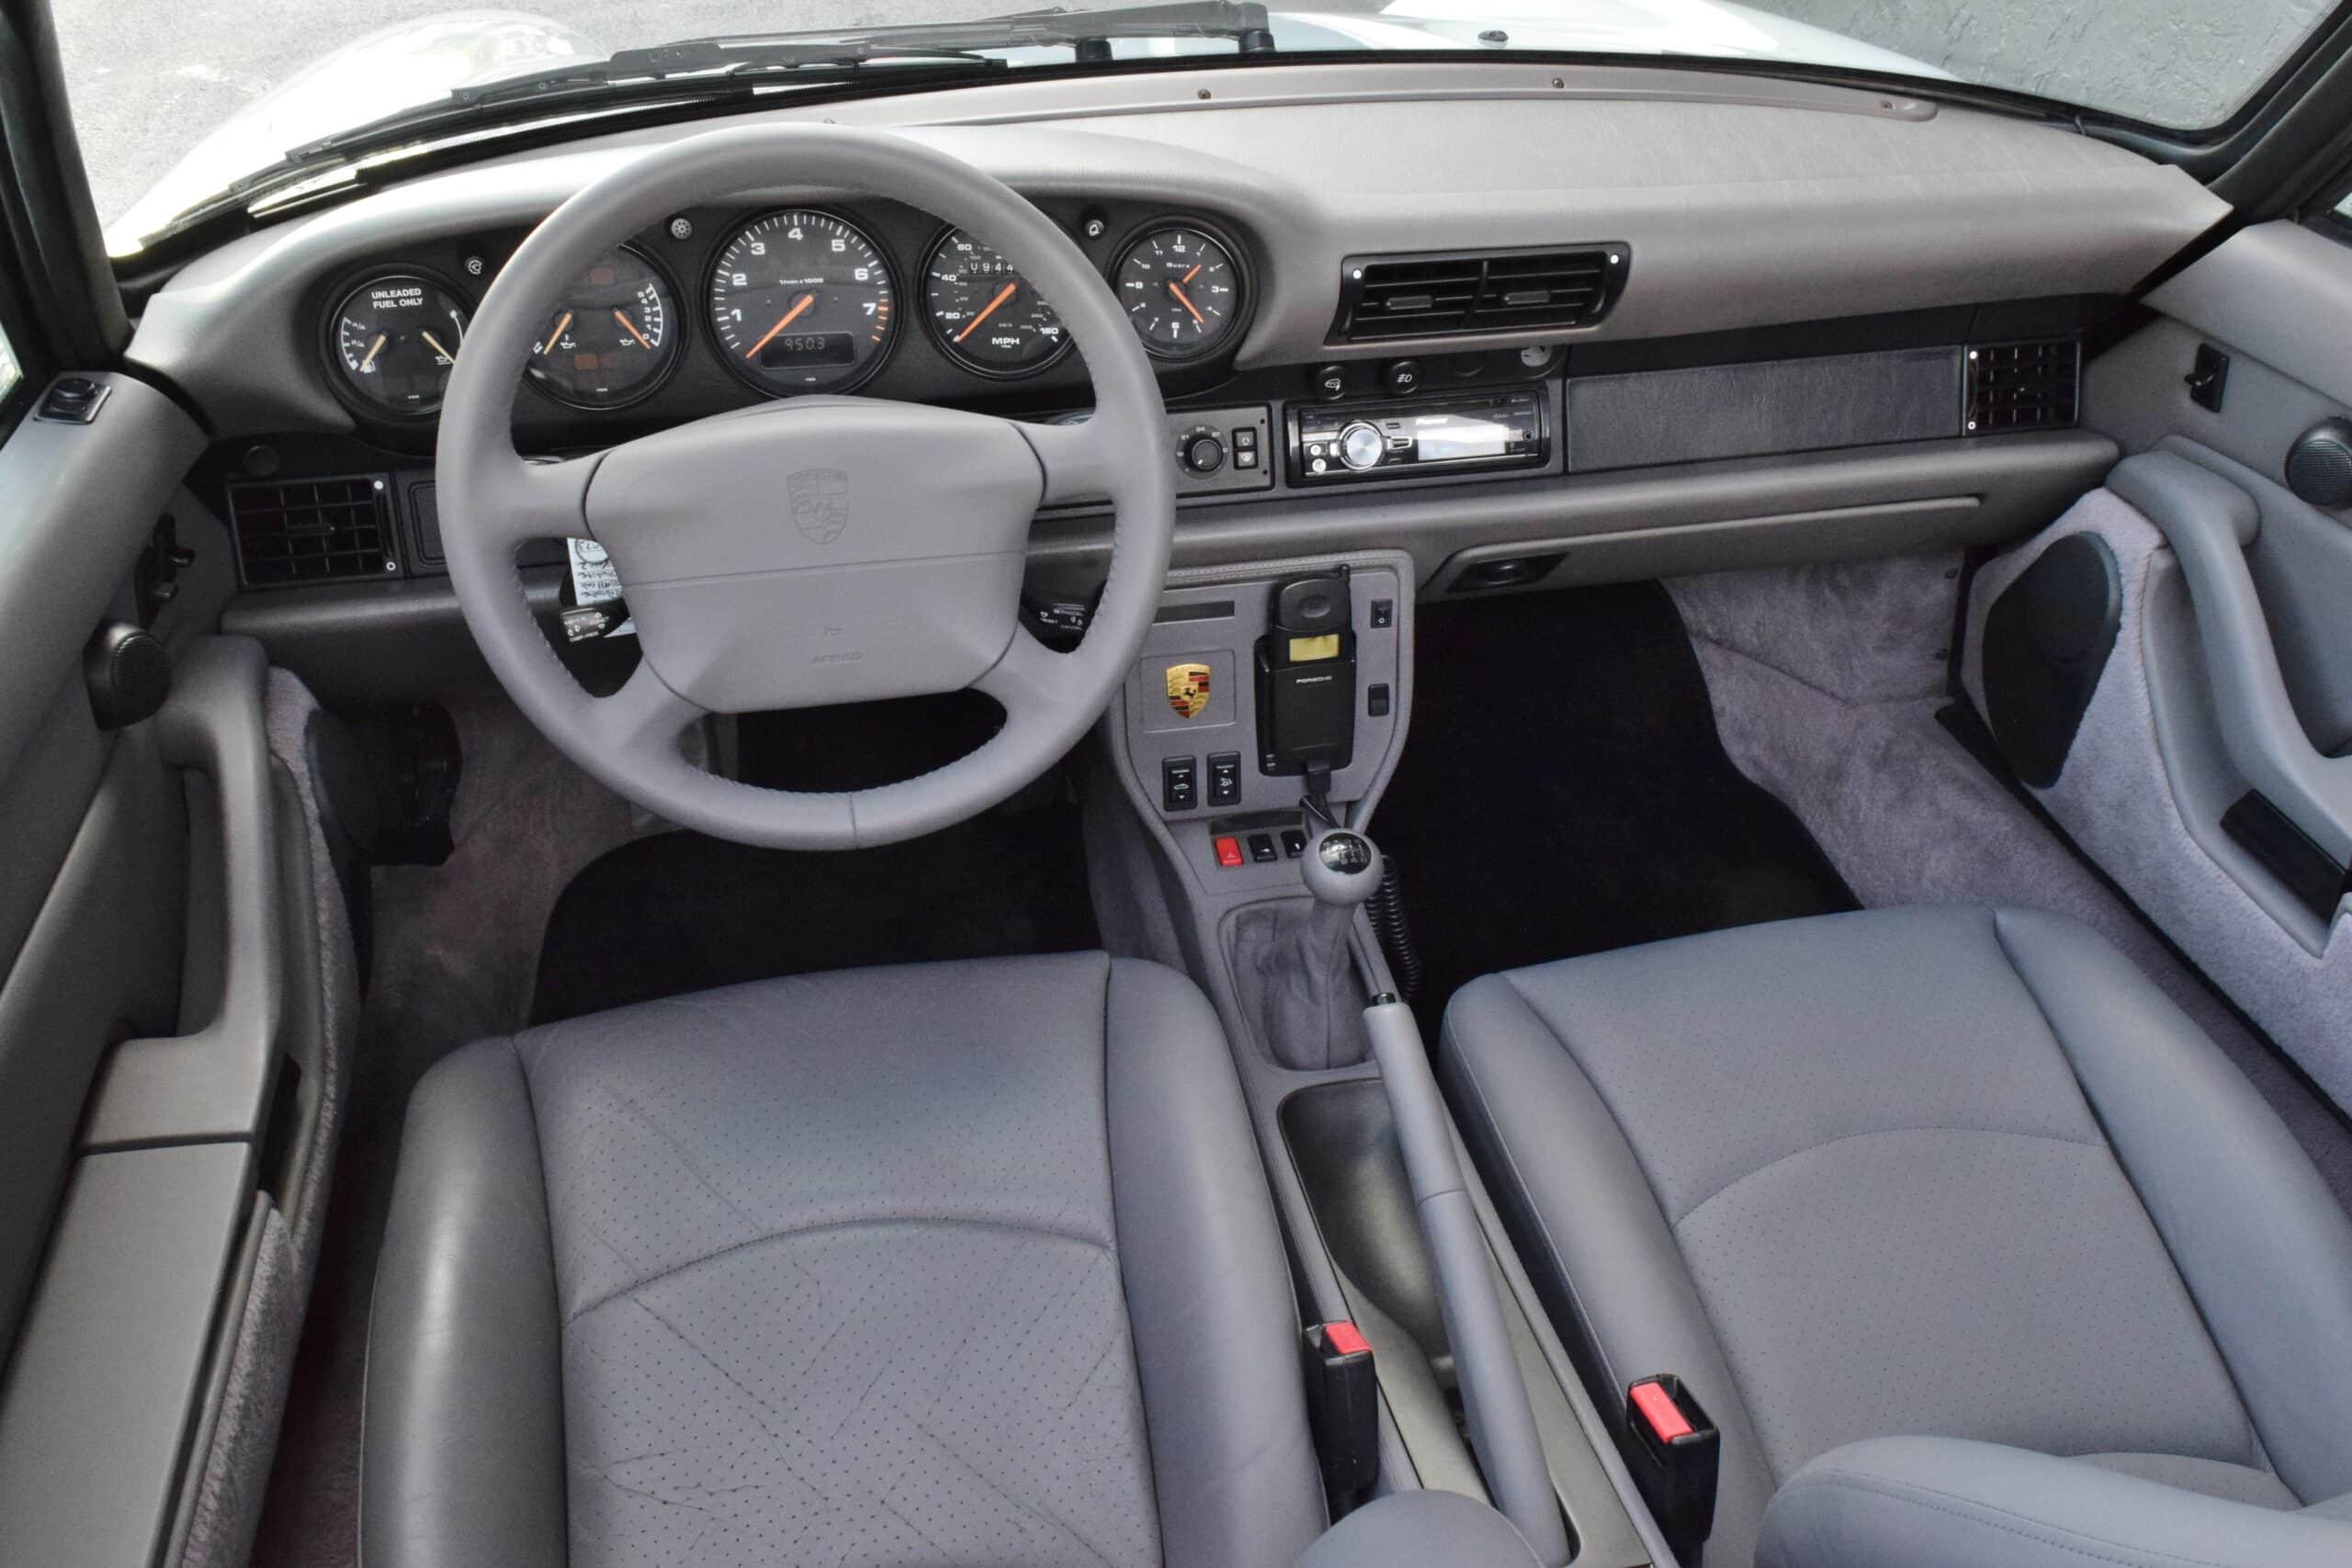 1995 Porsche 911 Carrera 993 Gran Prix White – New Convertible Top – Euro Height – Turbo Twists – Rare Option